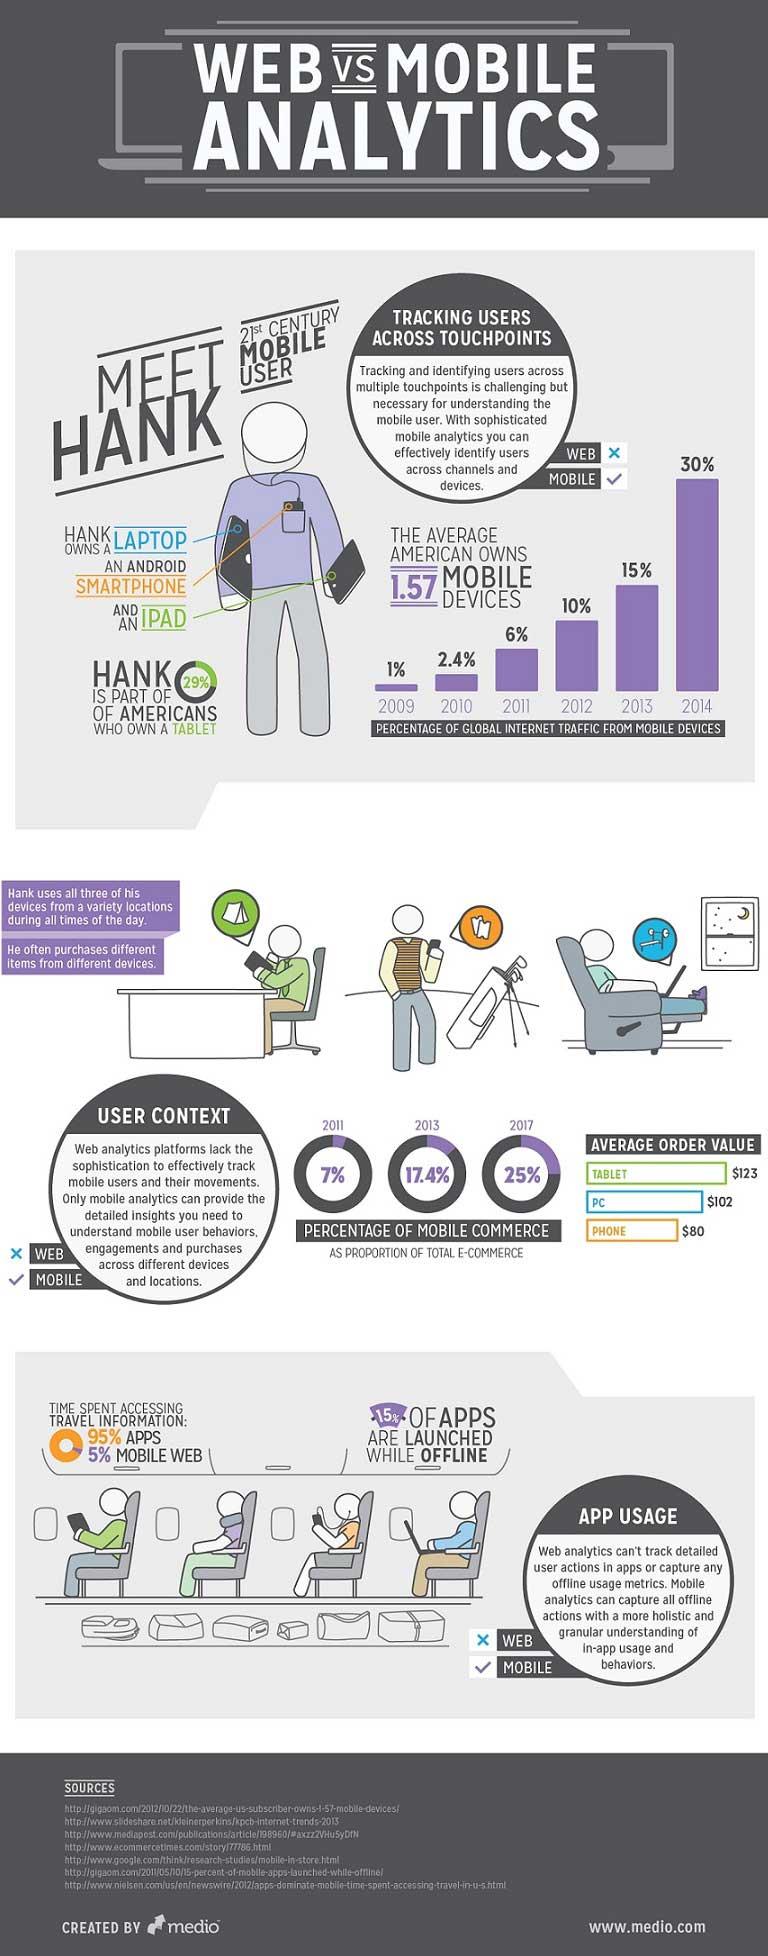 webvsmobile_infographic-900